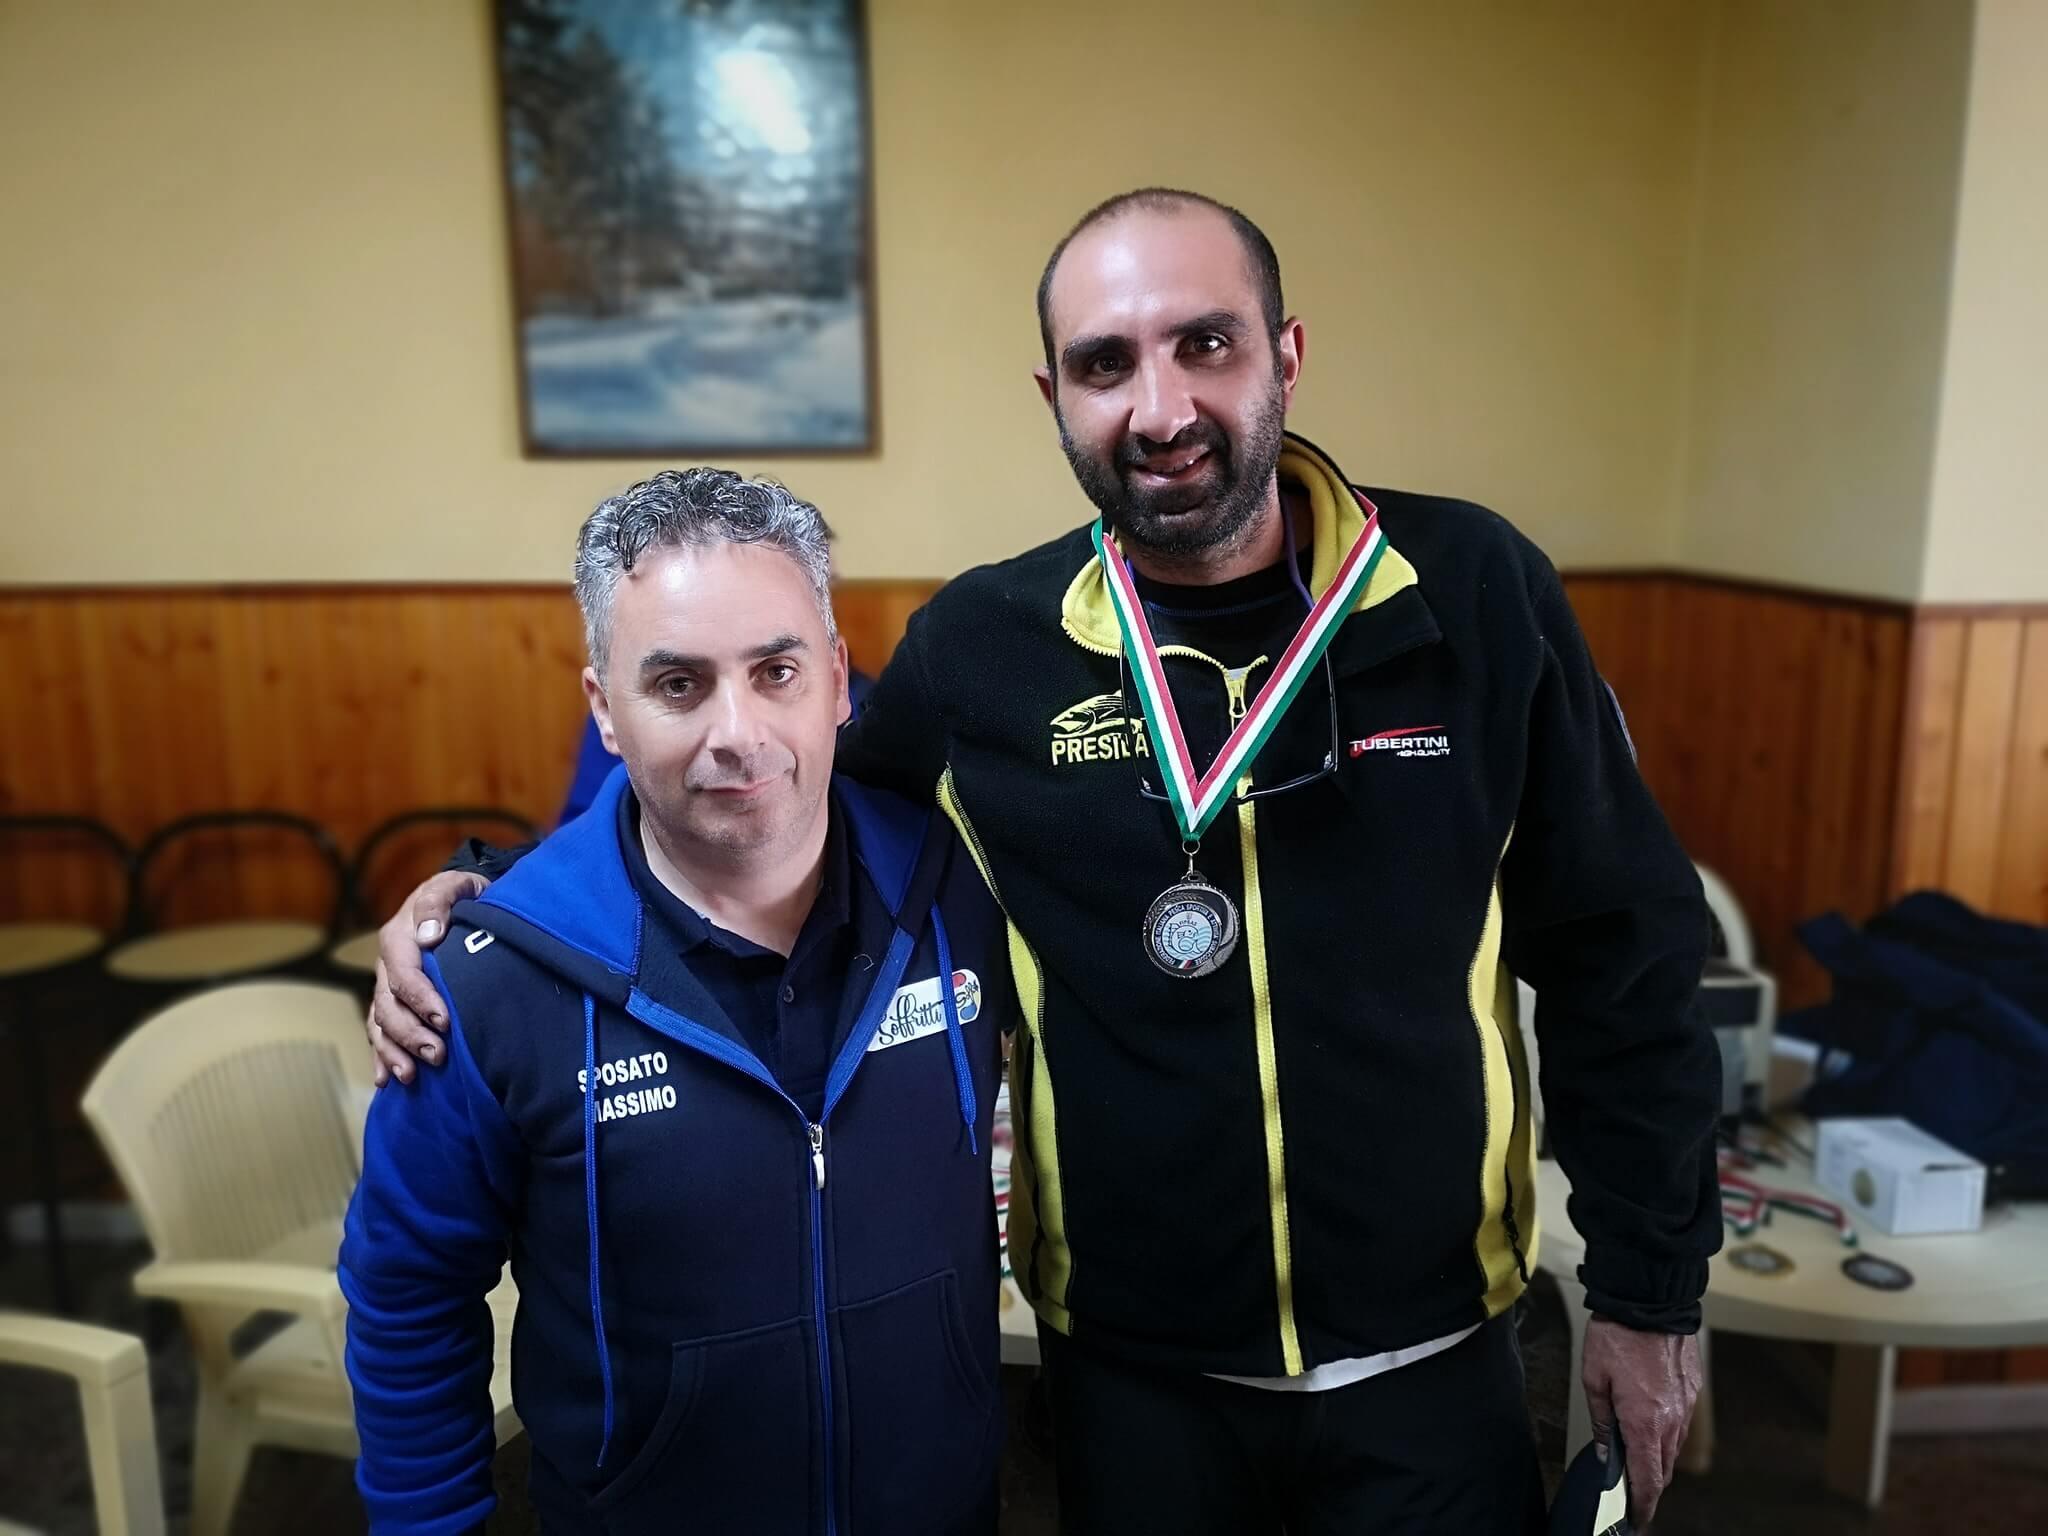 Seconda gara individuale trota lago cz 2019